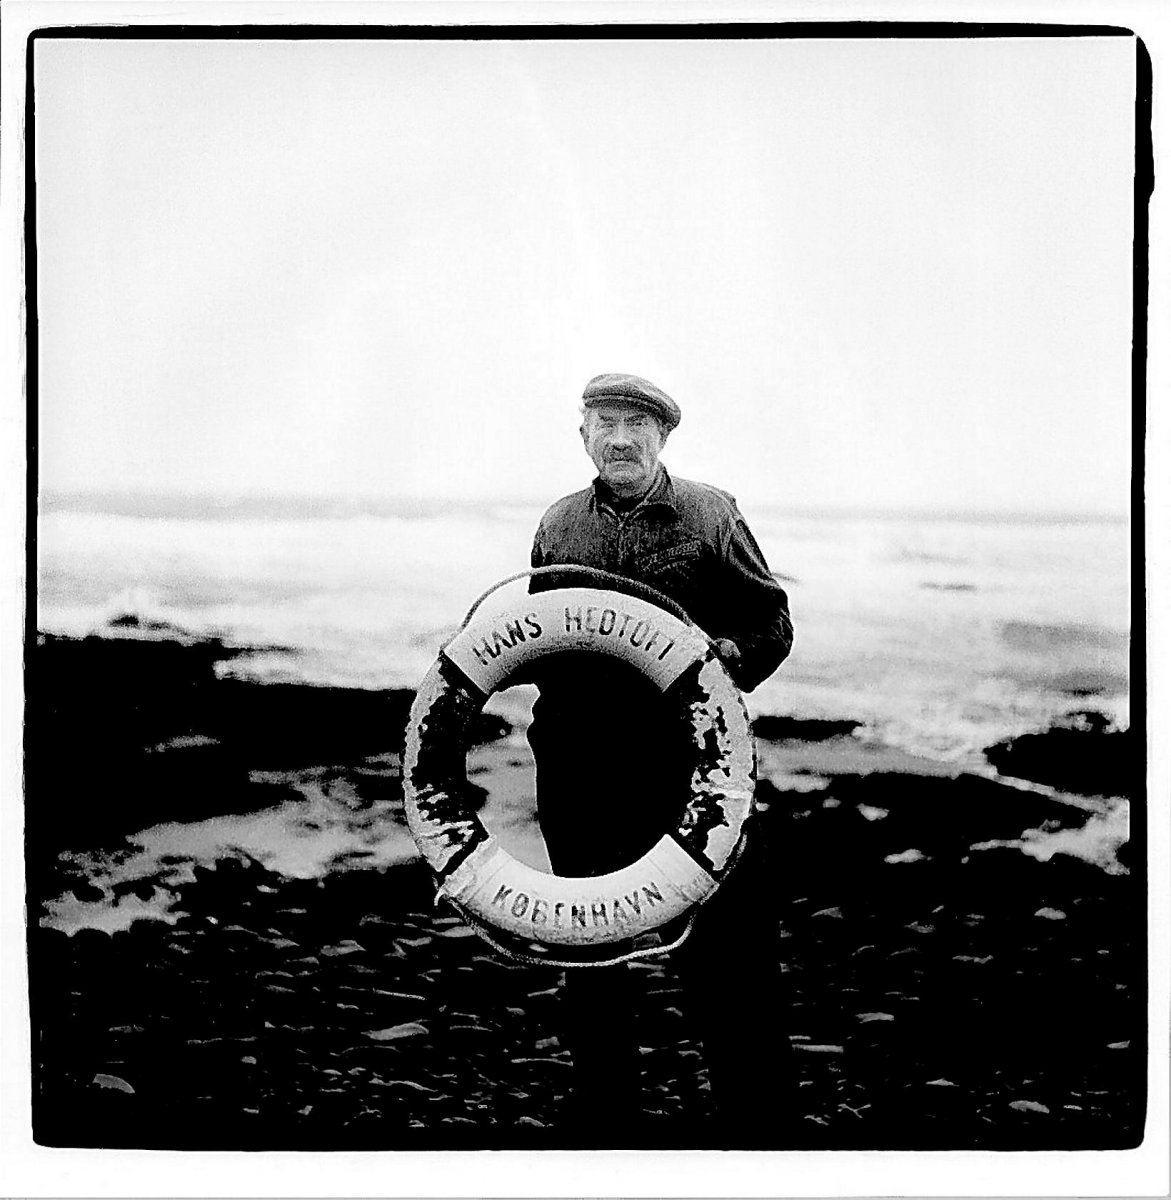 Magnus Haflidason 7 October 1959. Photo Mbl, автор Olafur K Magnusson